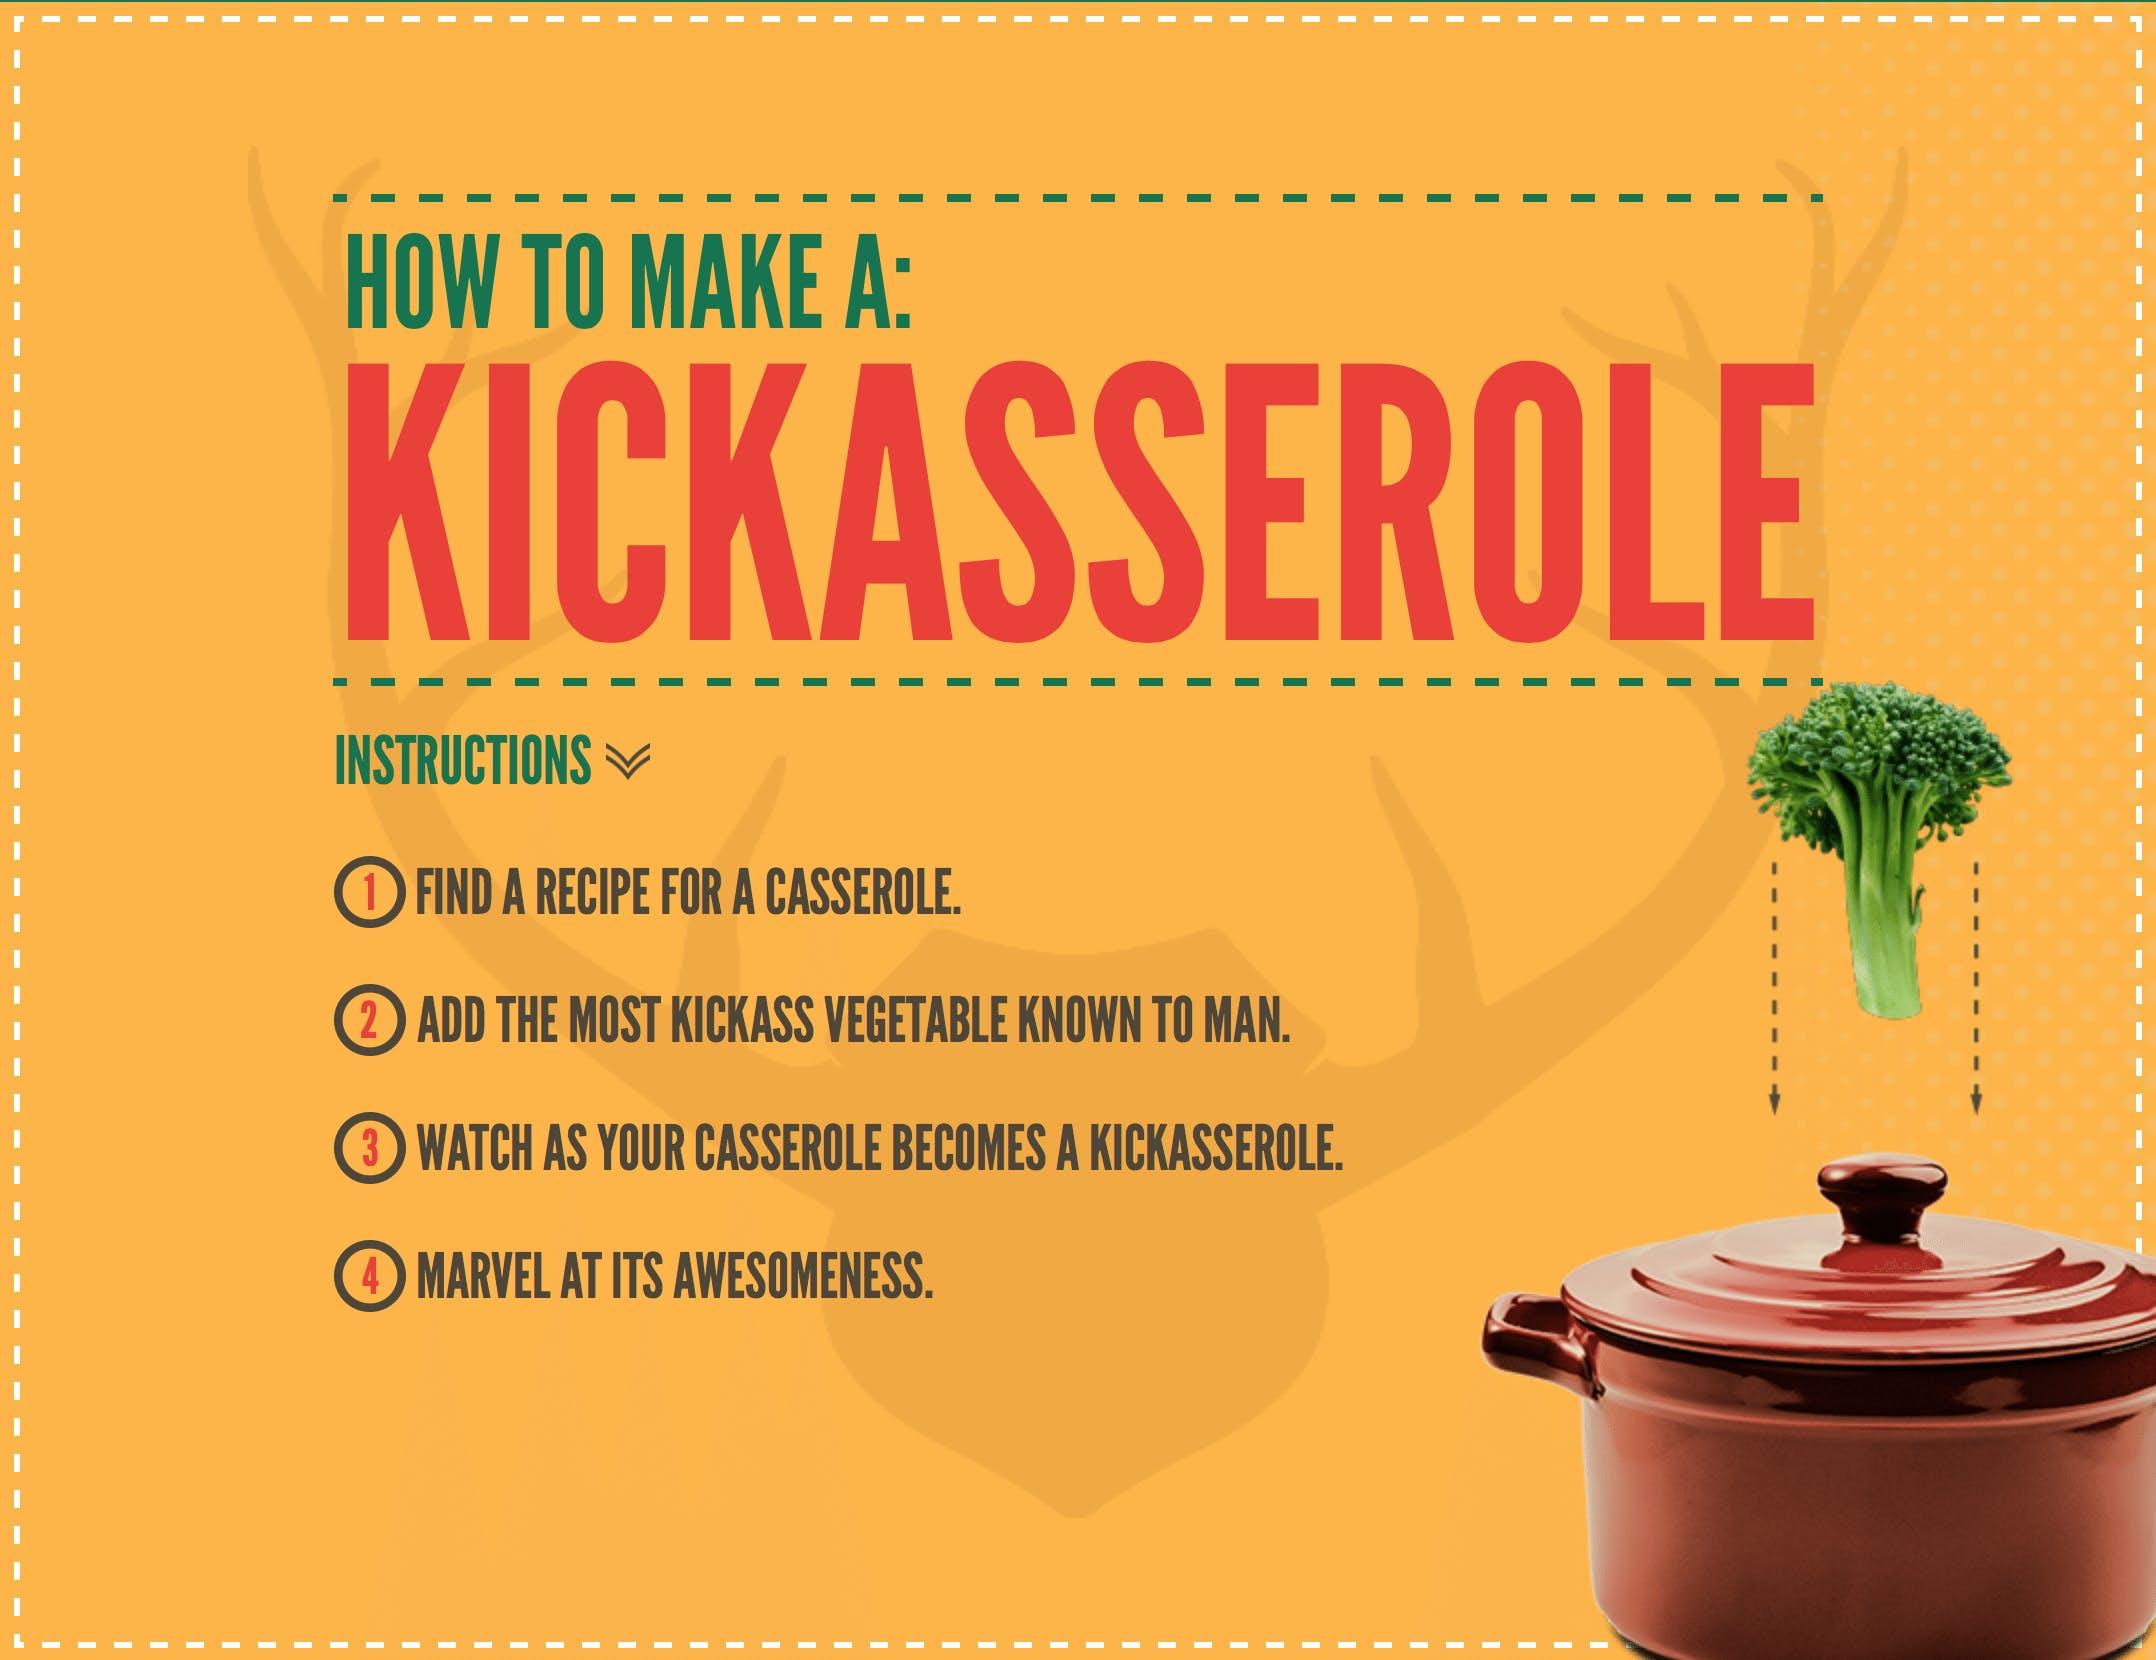 Broccoli (!) Gets a Marketing Campaign